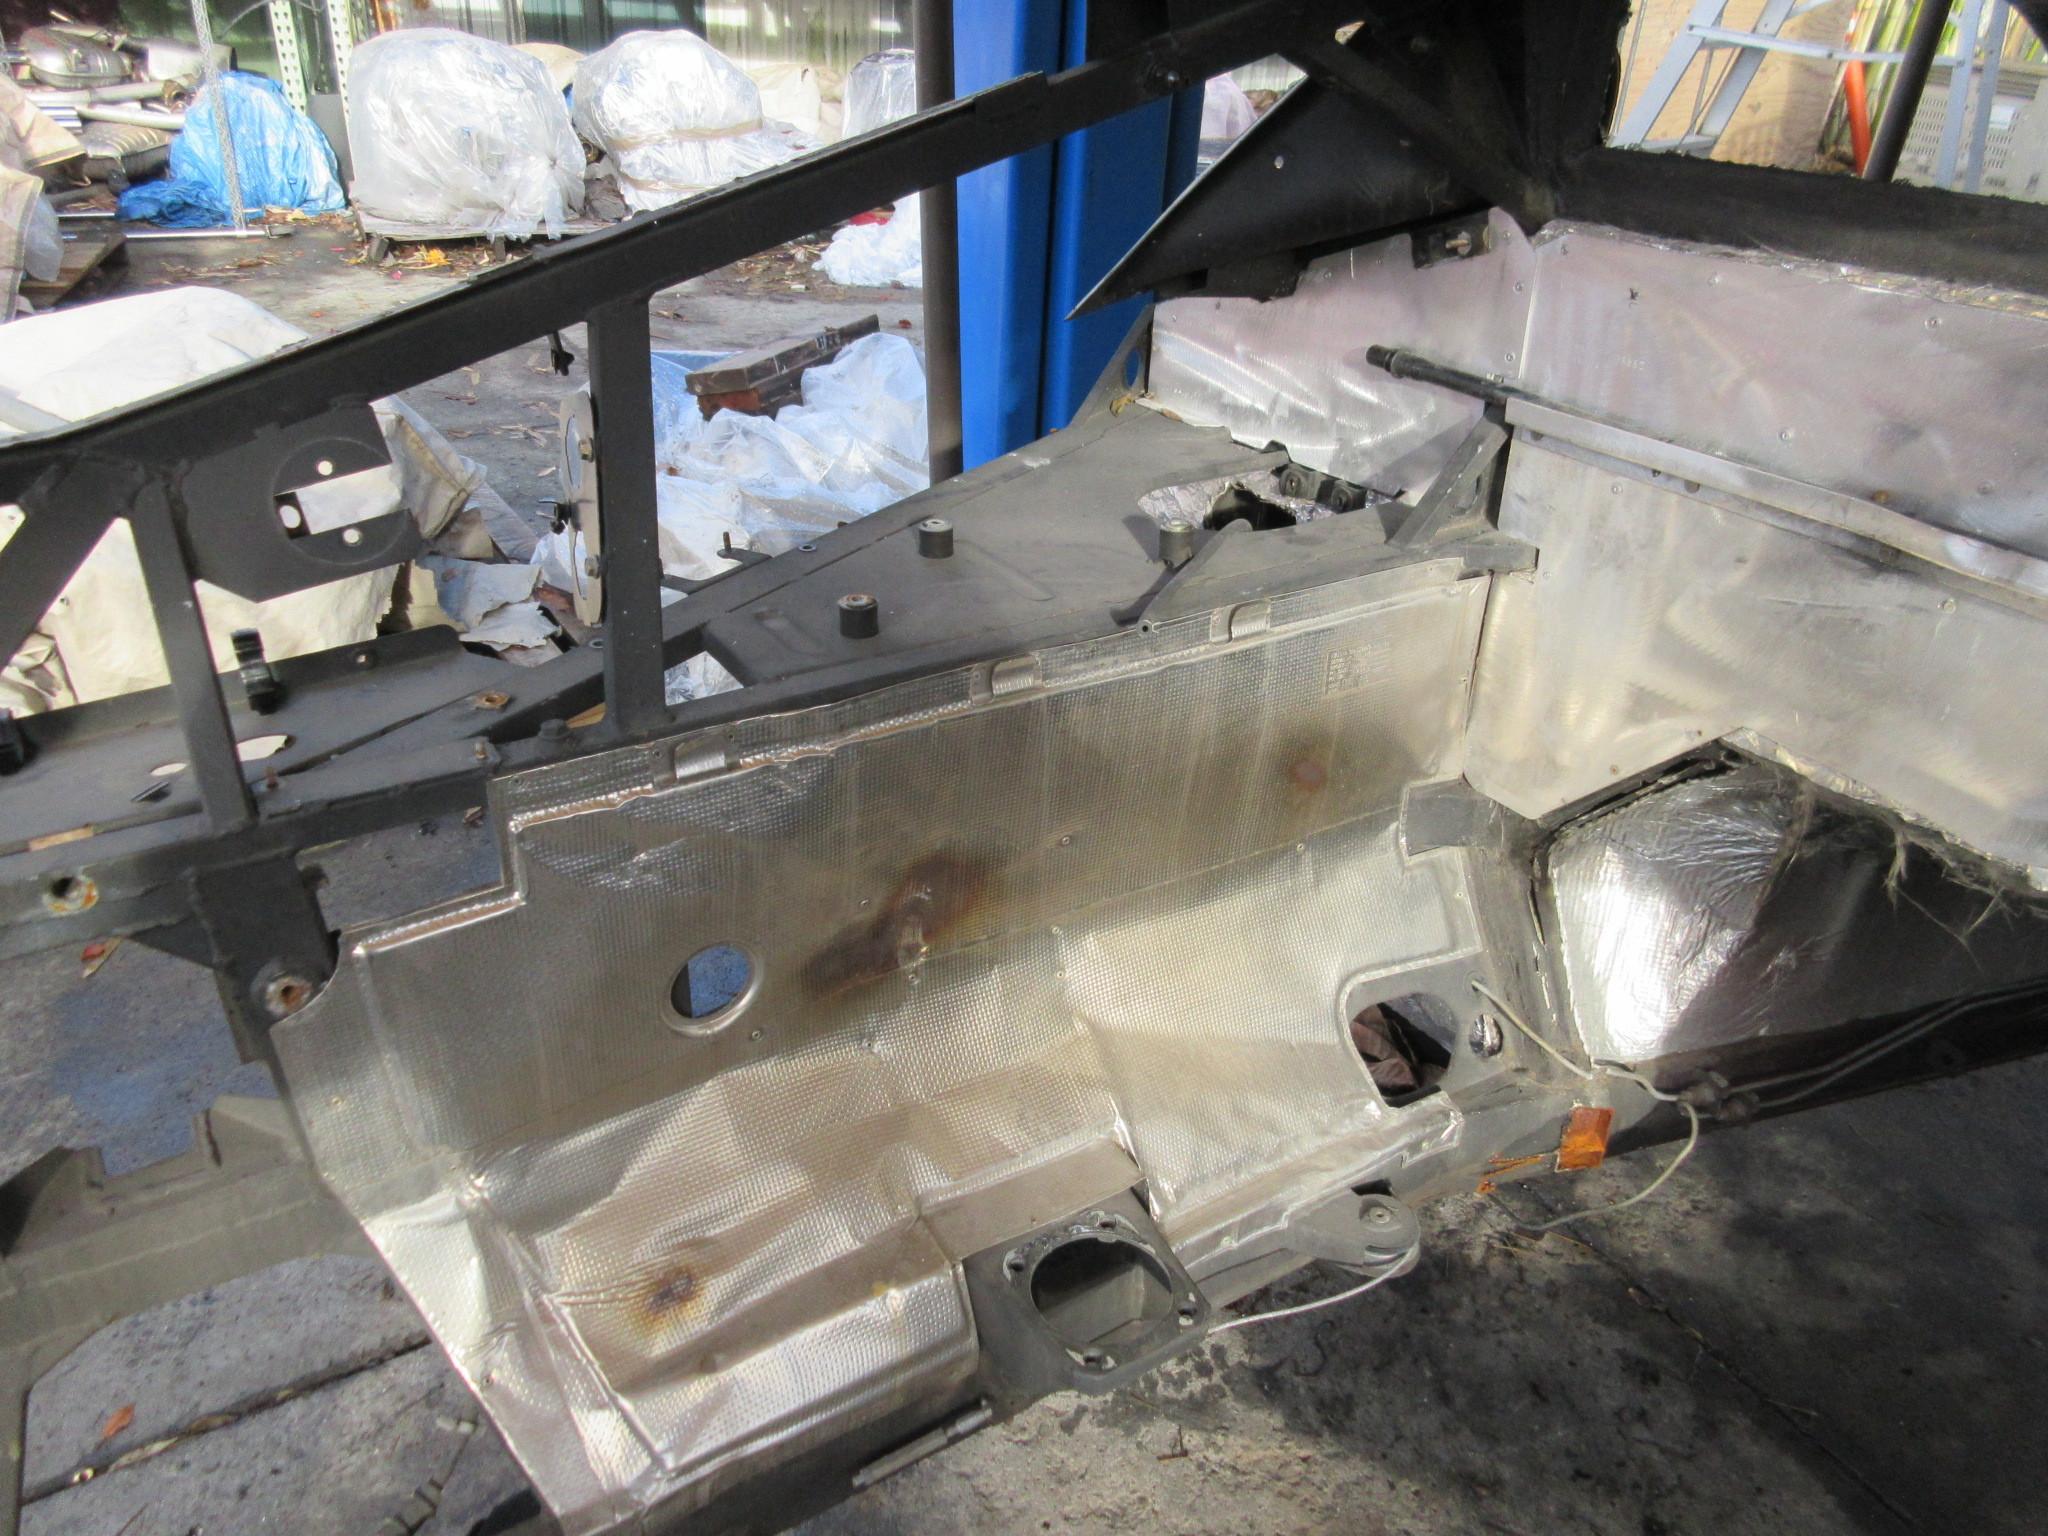 04 Lamborghini Murcielago 1025 Body Frame Shell Chassis Left